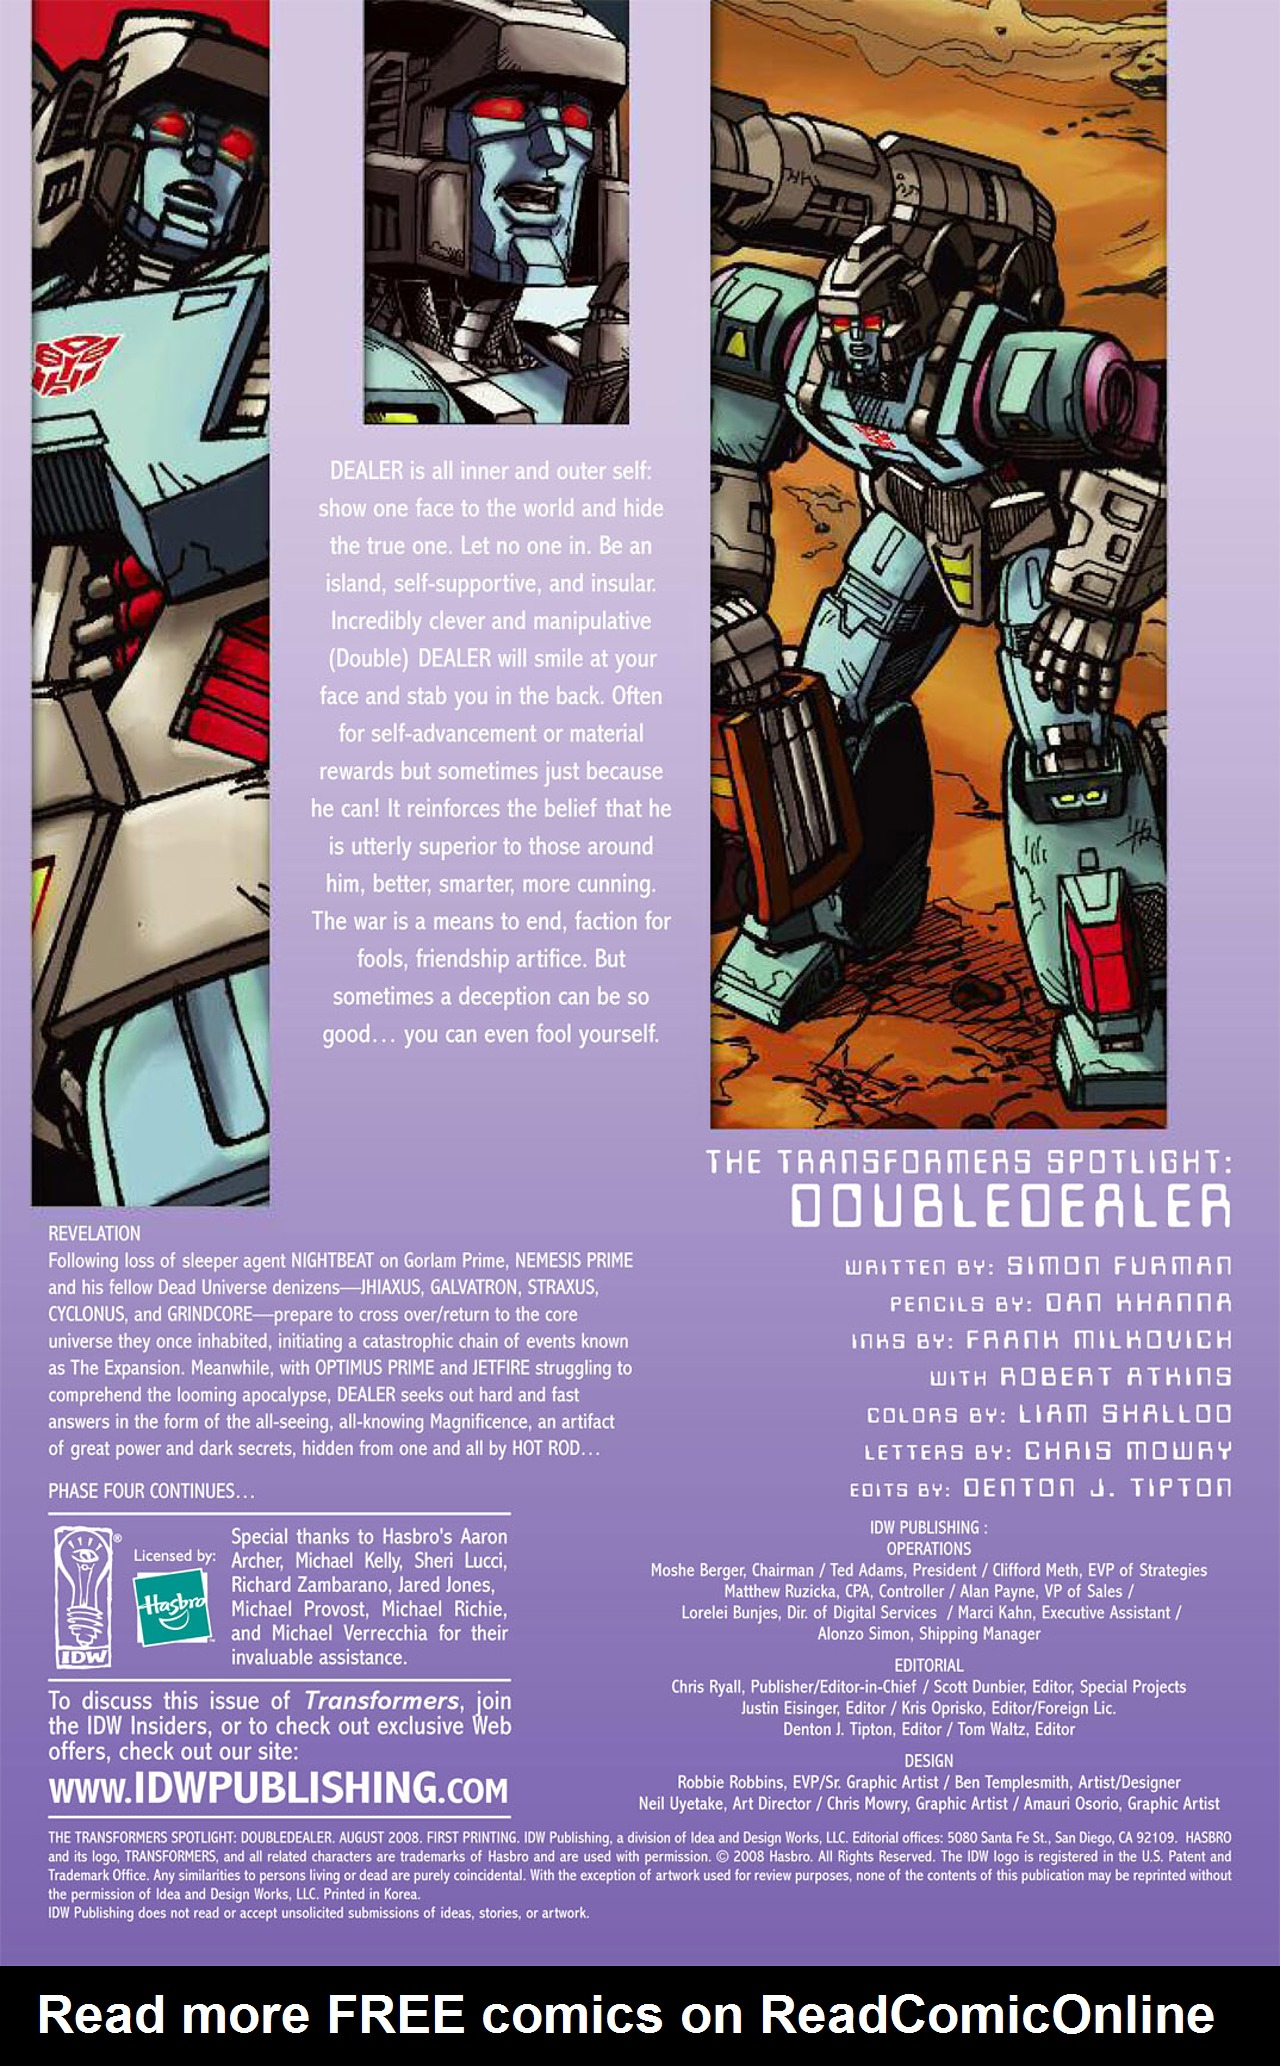 Read online Transformers Spotlight: Doubledealer comic -  Issue # Full - 3